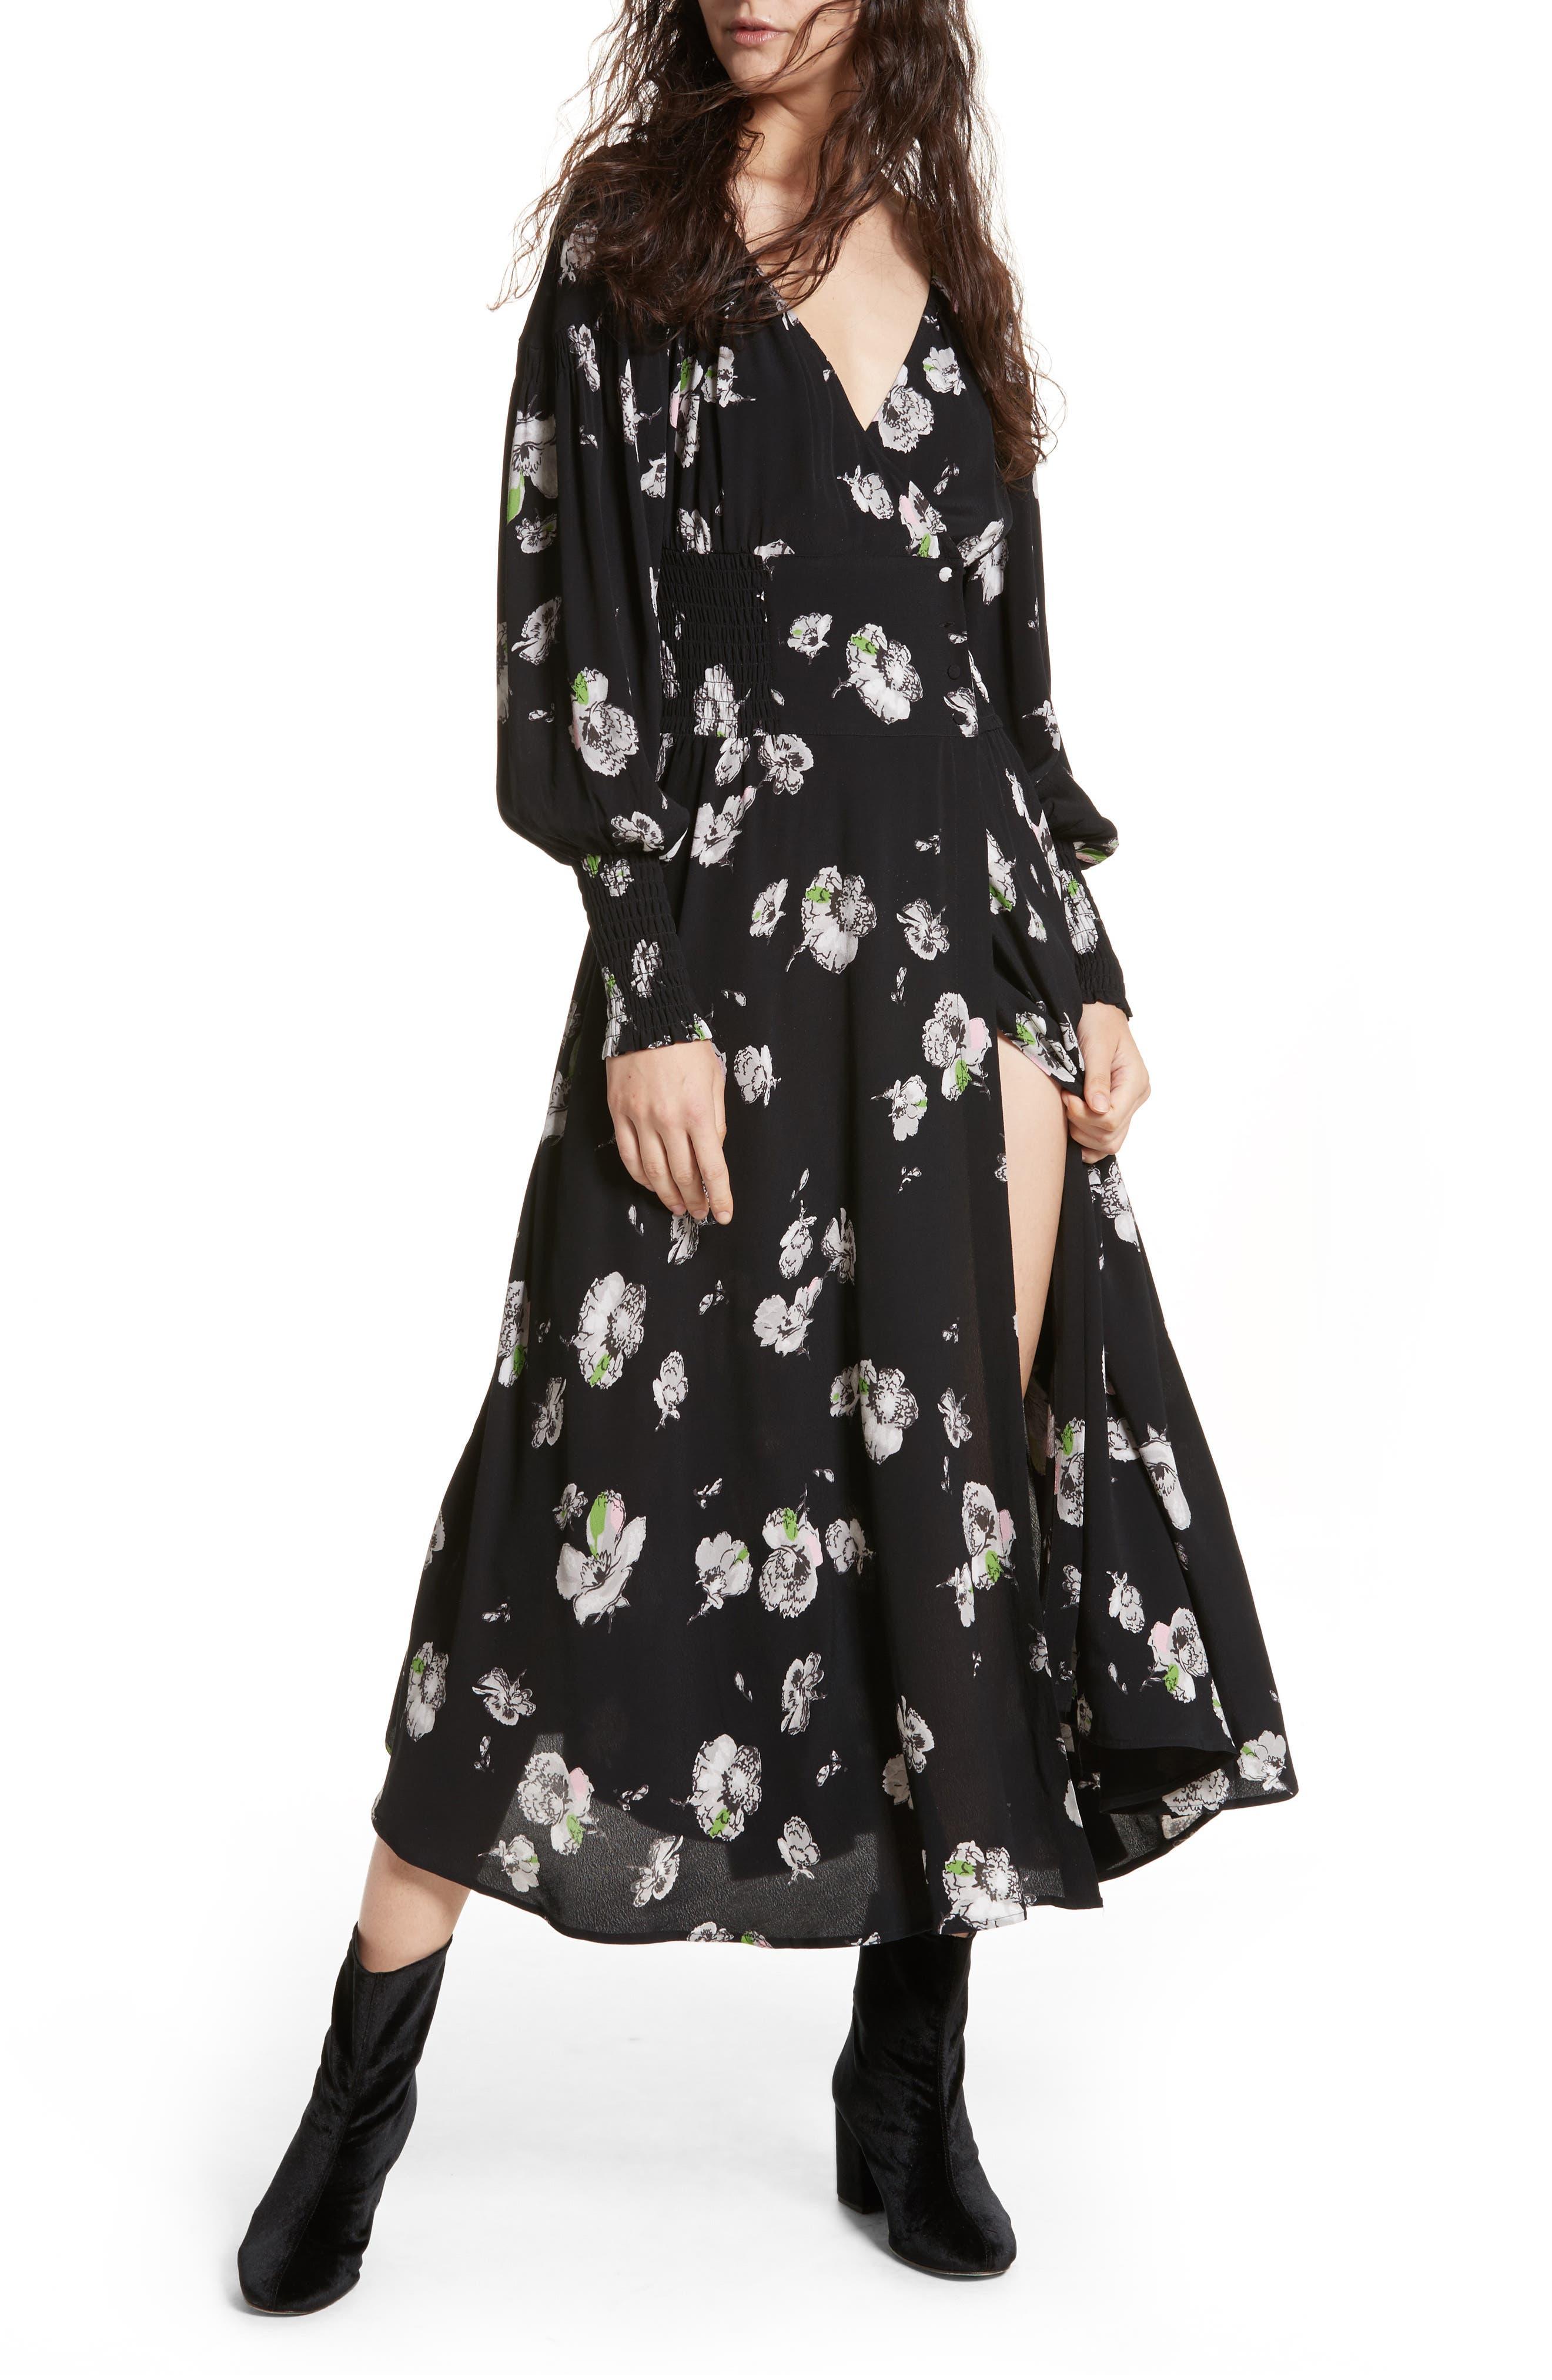 So Sweetly Midi Dress,                             Main thumbnail 1, color,                             001